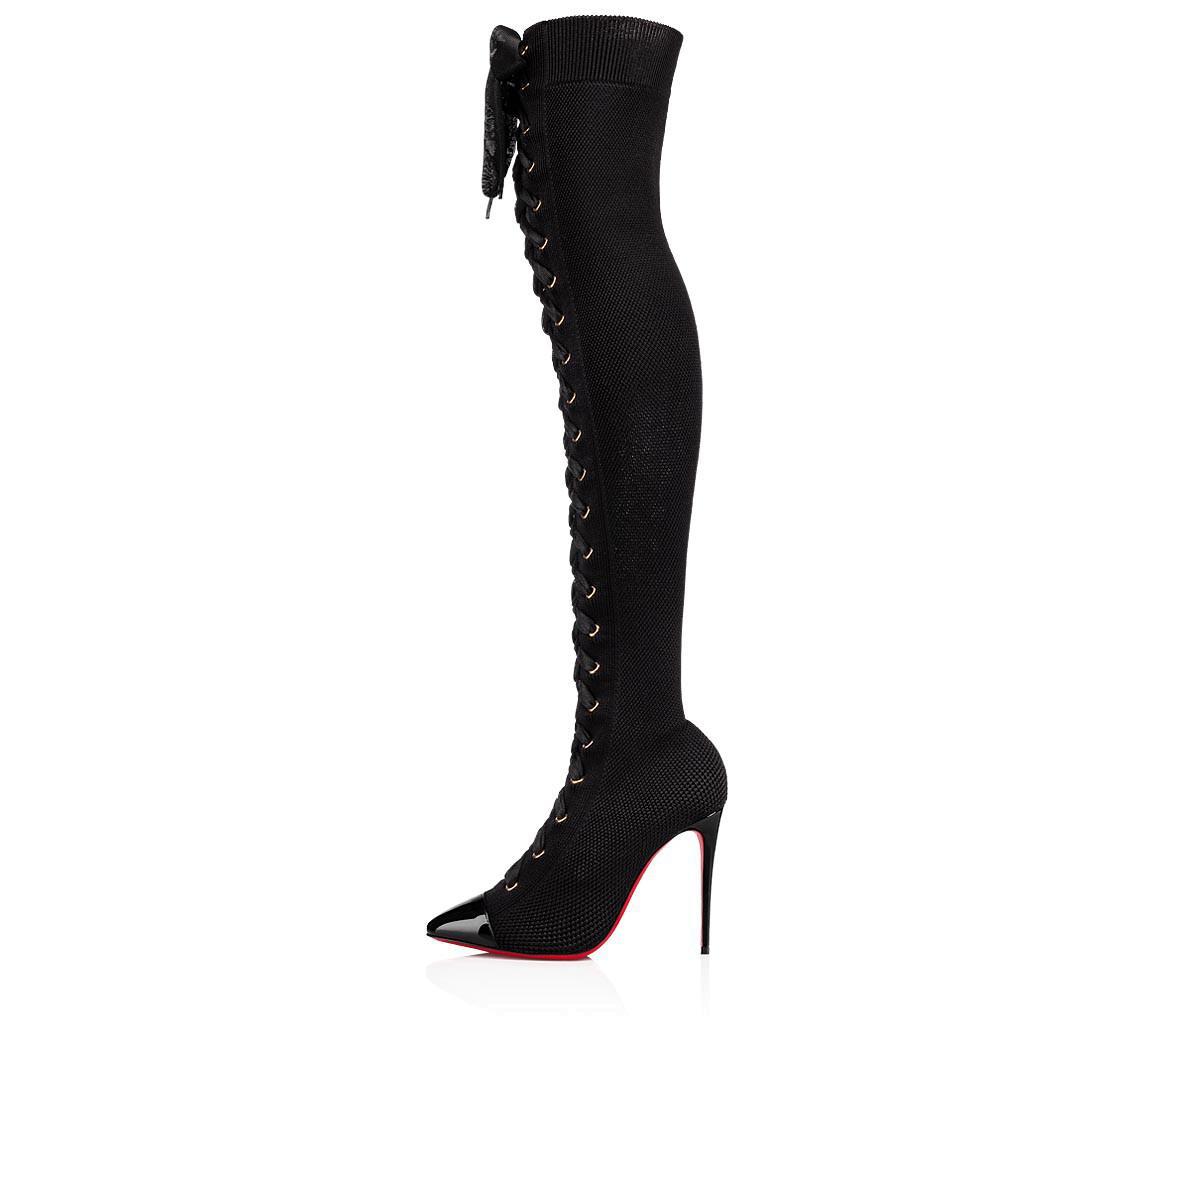 4e36609cf986 Christian Louboutin - Black Frenchie Boot - Lyst. View fullscreen